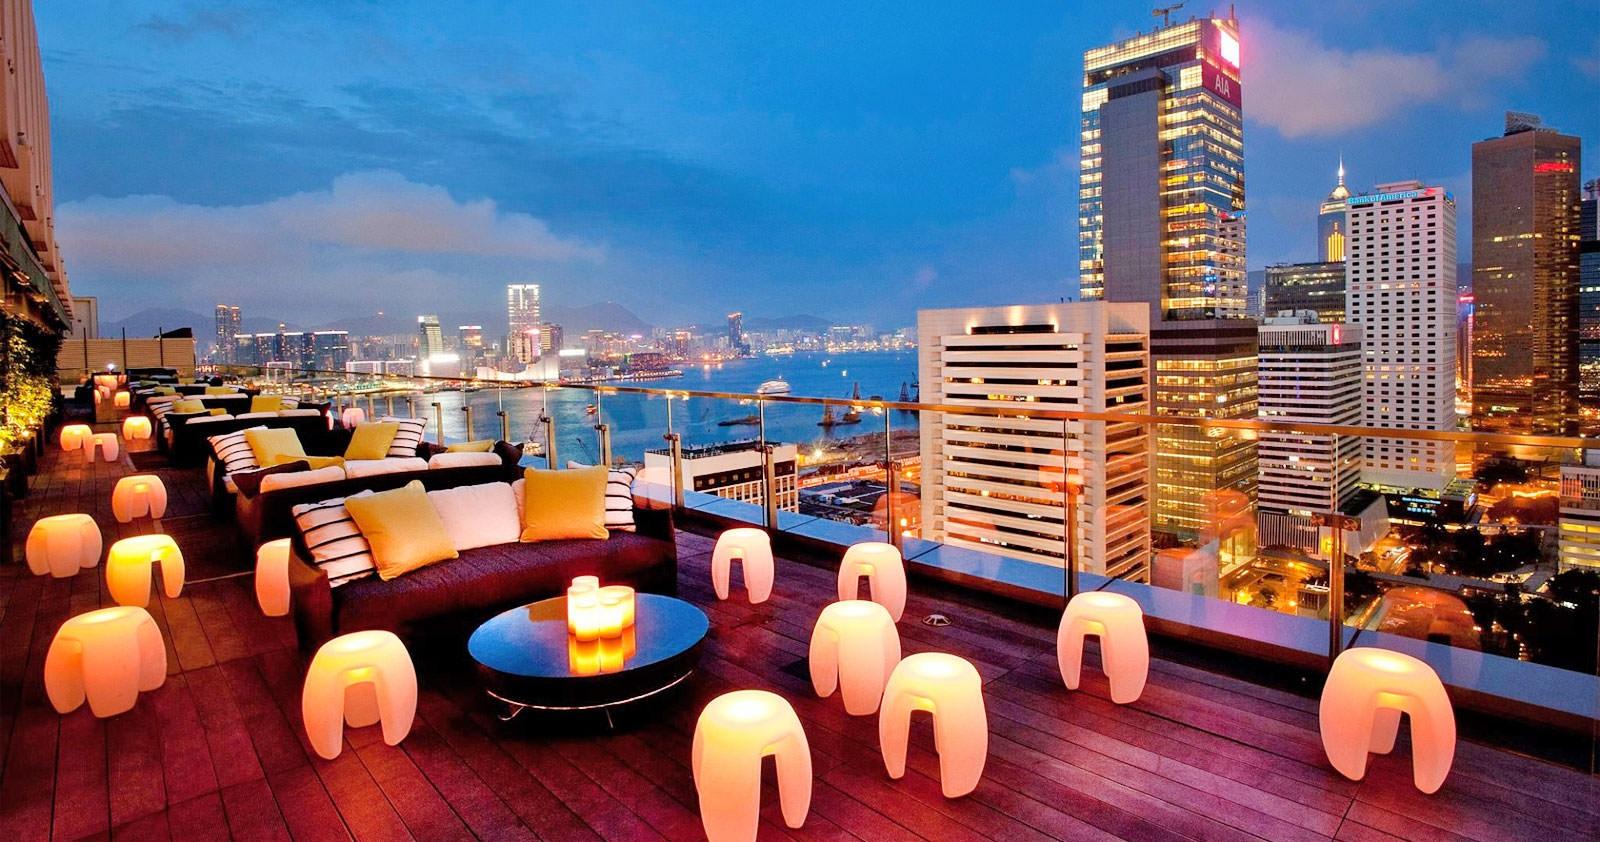 29. Sevva || Hong Kong